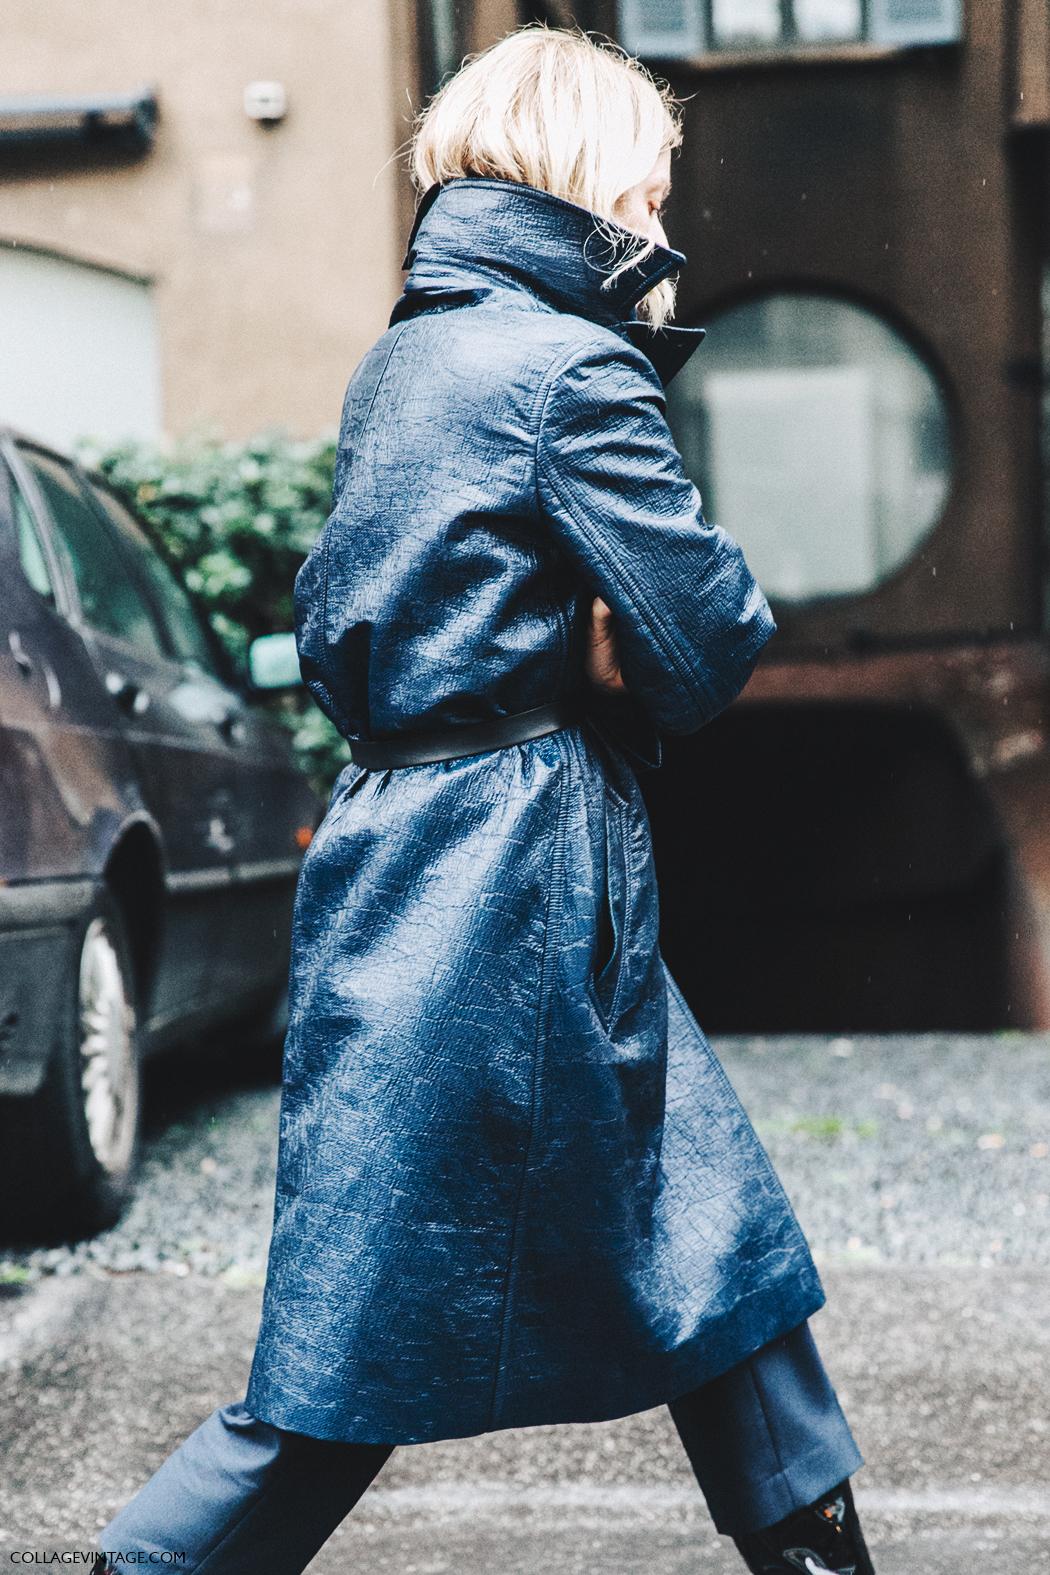 Milan_Fashion_Week_Fall_16-MFW-Street_Style-Collage_Vintage-Rainy_Coat-Navy_Blue-